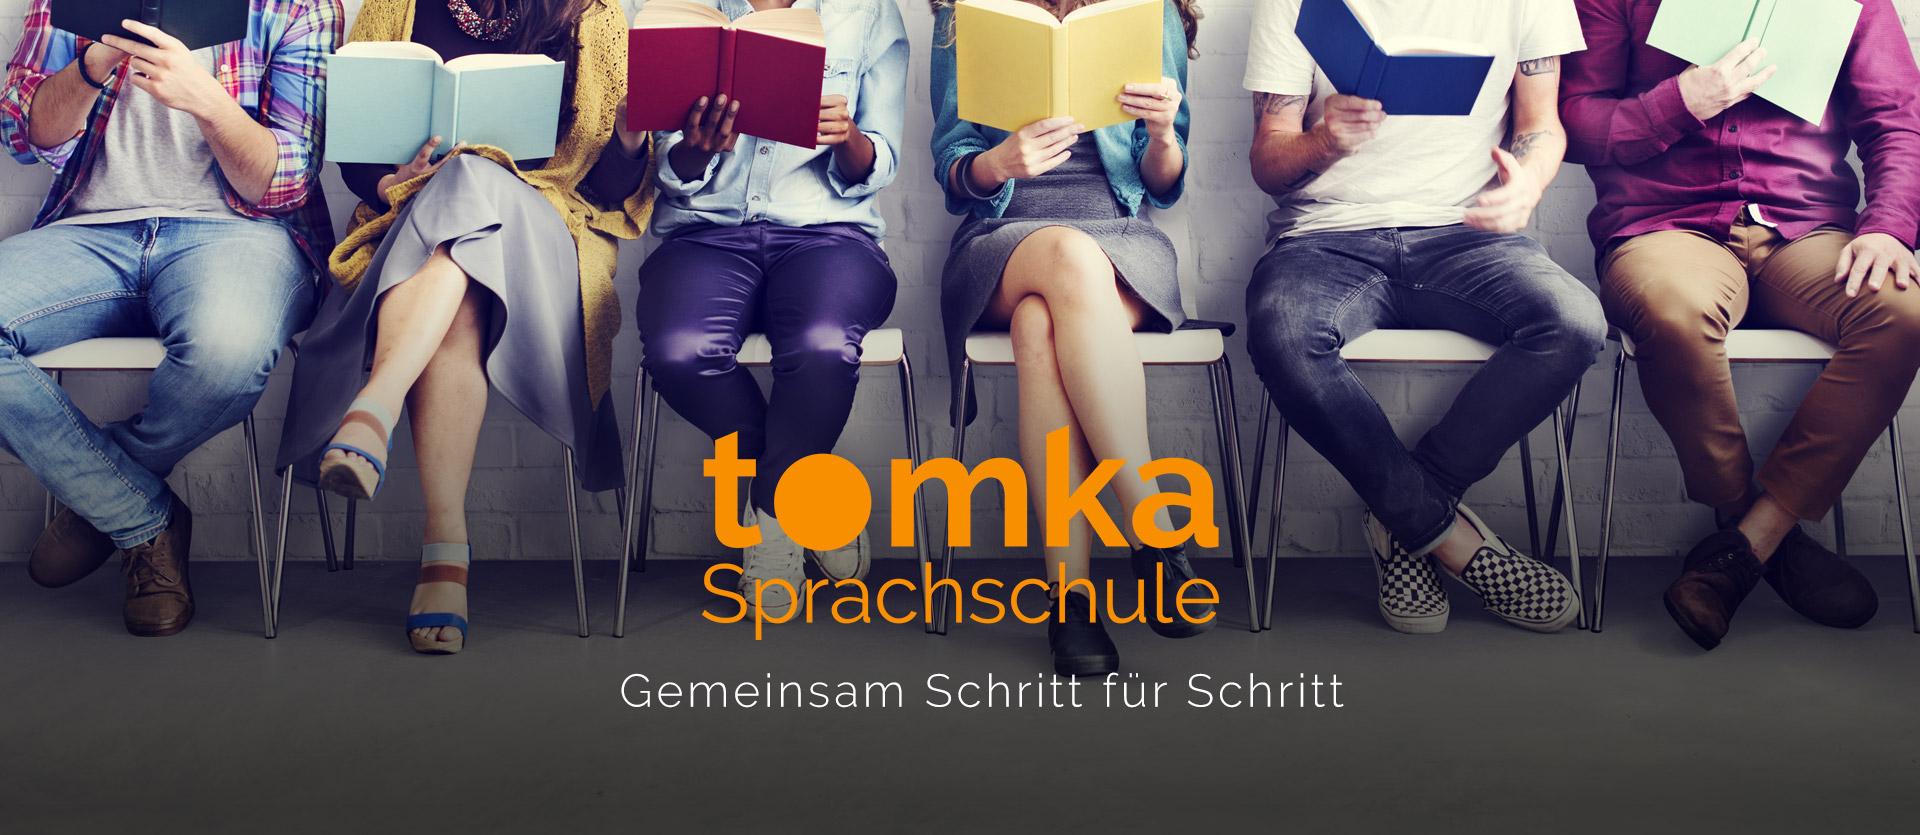 tomka-sprachschule-dresden-lernen